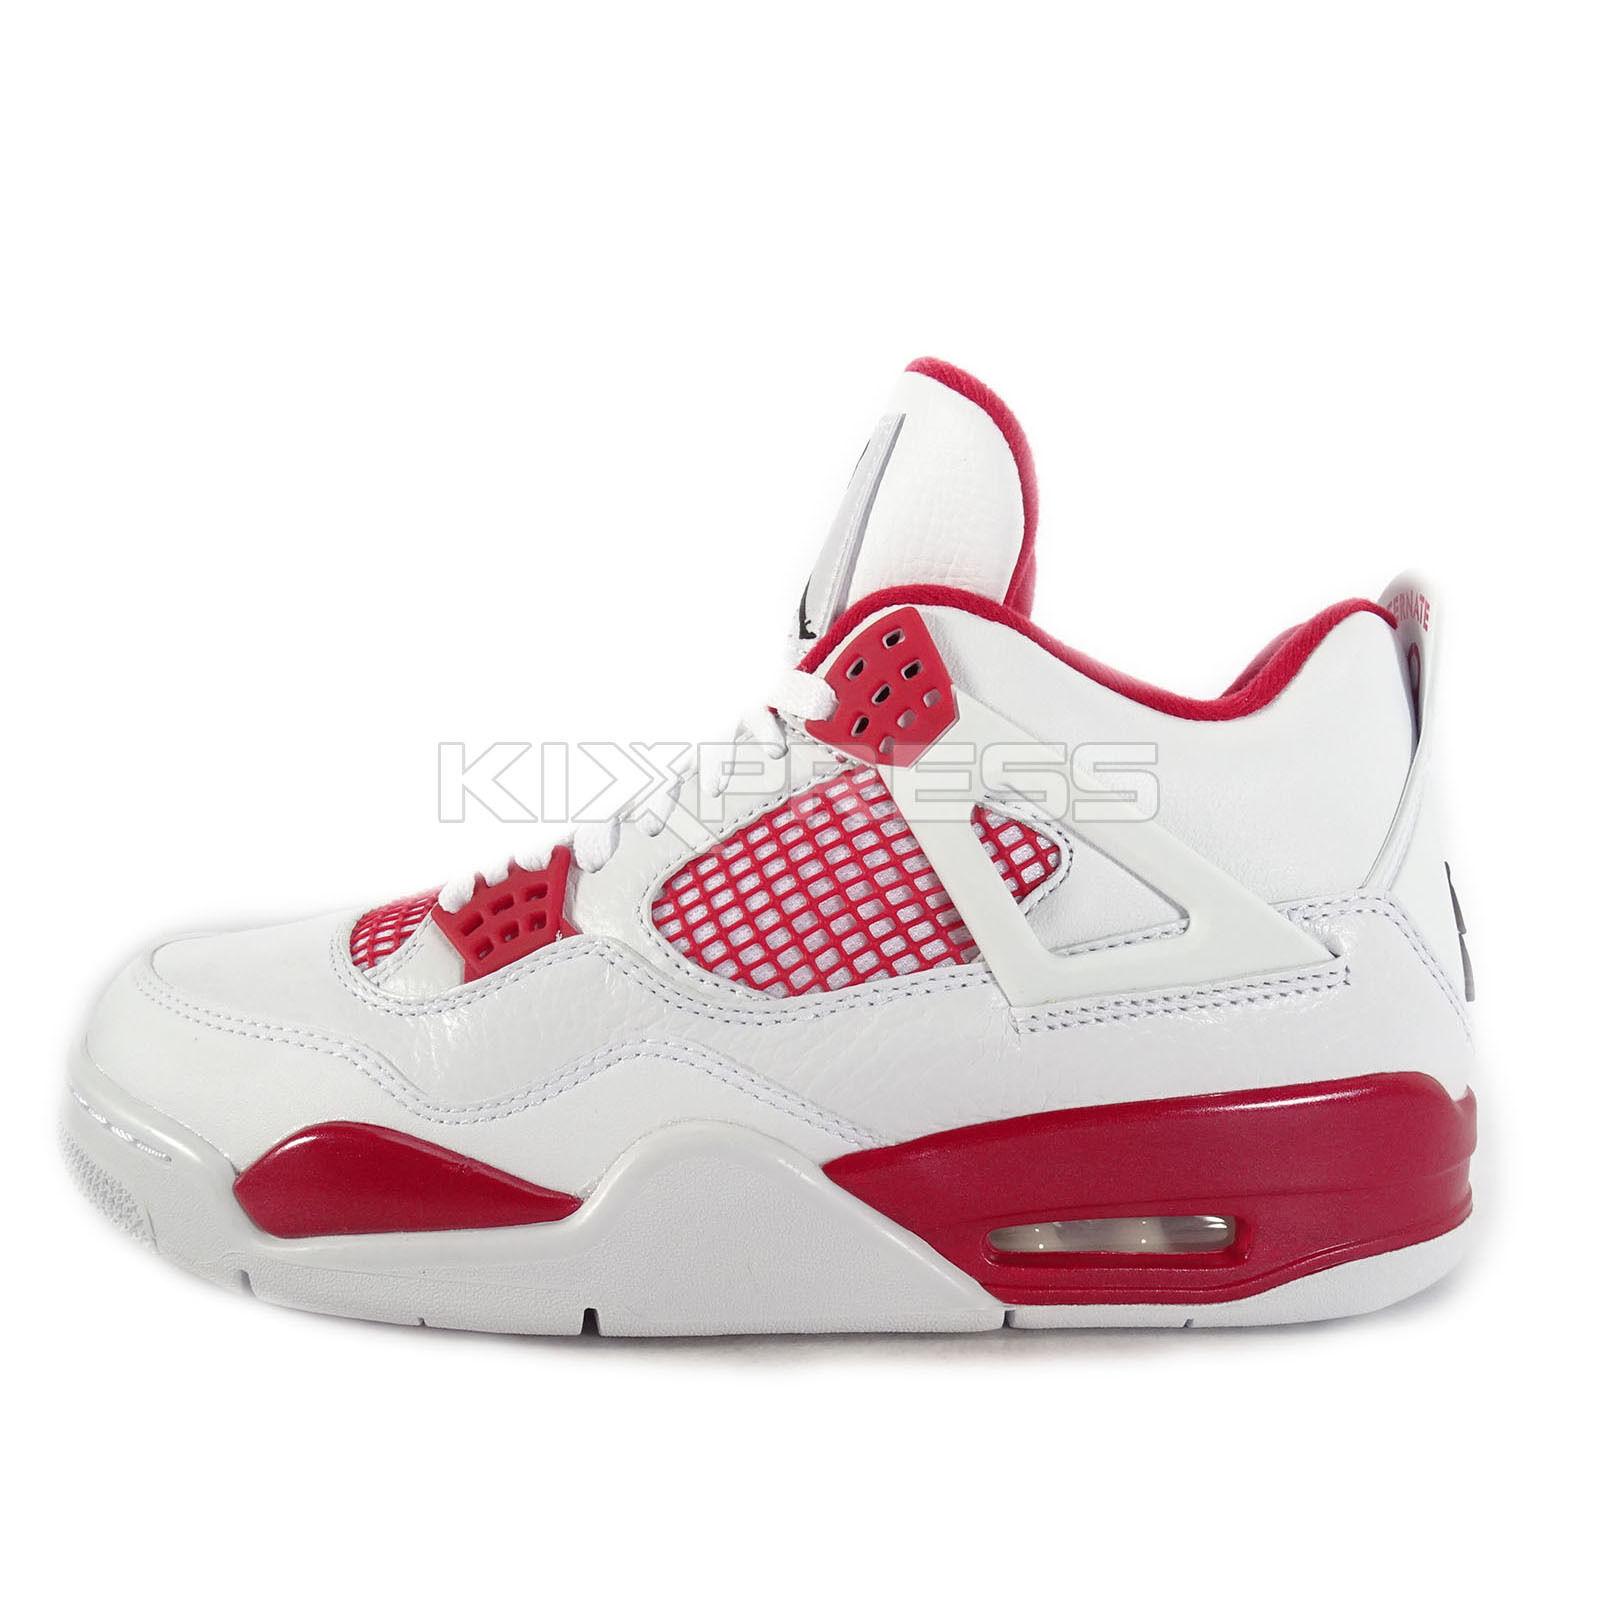 abd9d199cf2d7c best Nike Air Jordan 4 Retro  308497-106  Basketball Alternate 89 White  Black-Gym Red